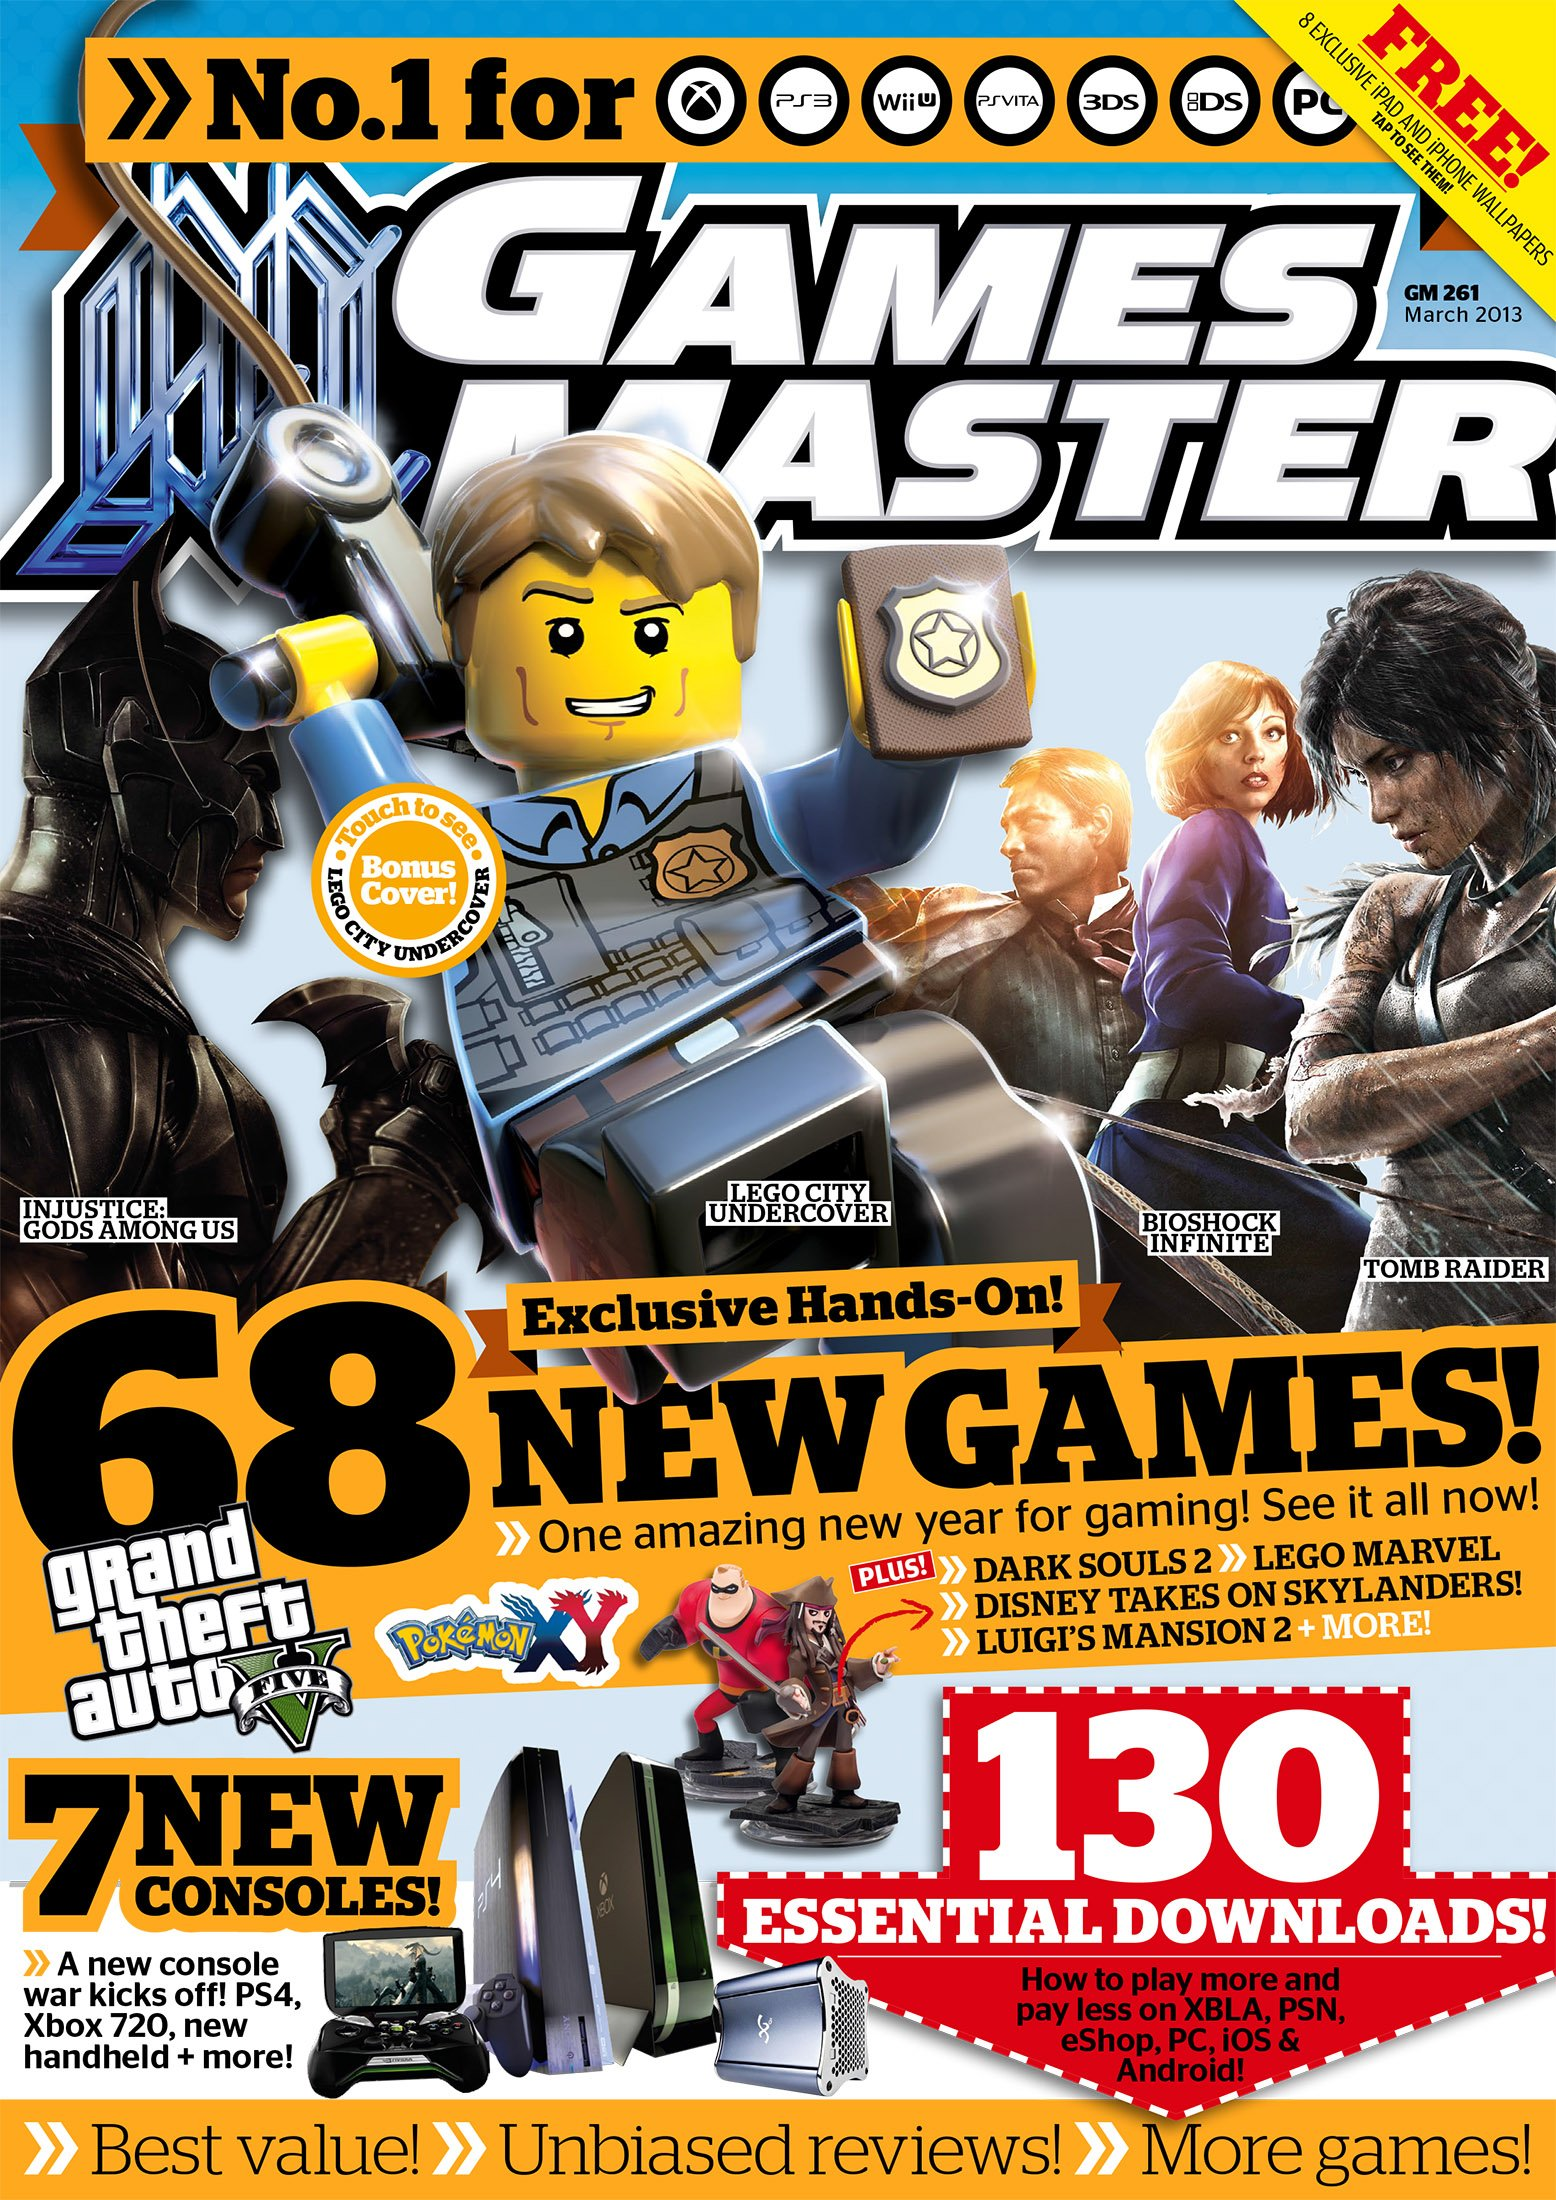 GamesMaster Issue 261 (March 2013) (digital edition)